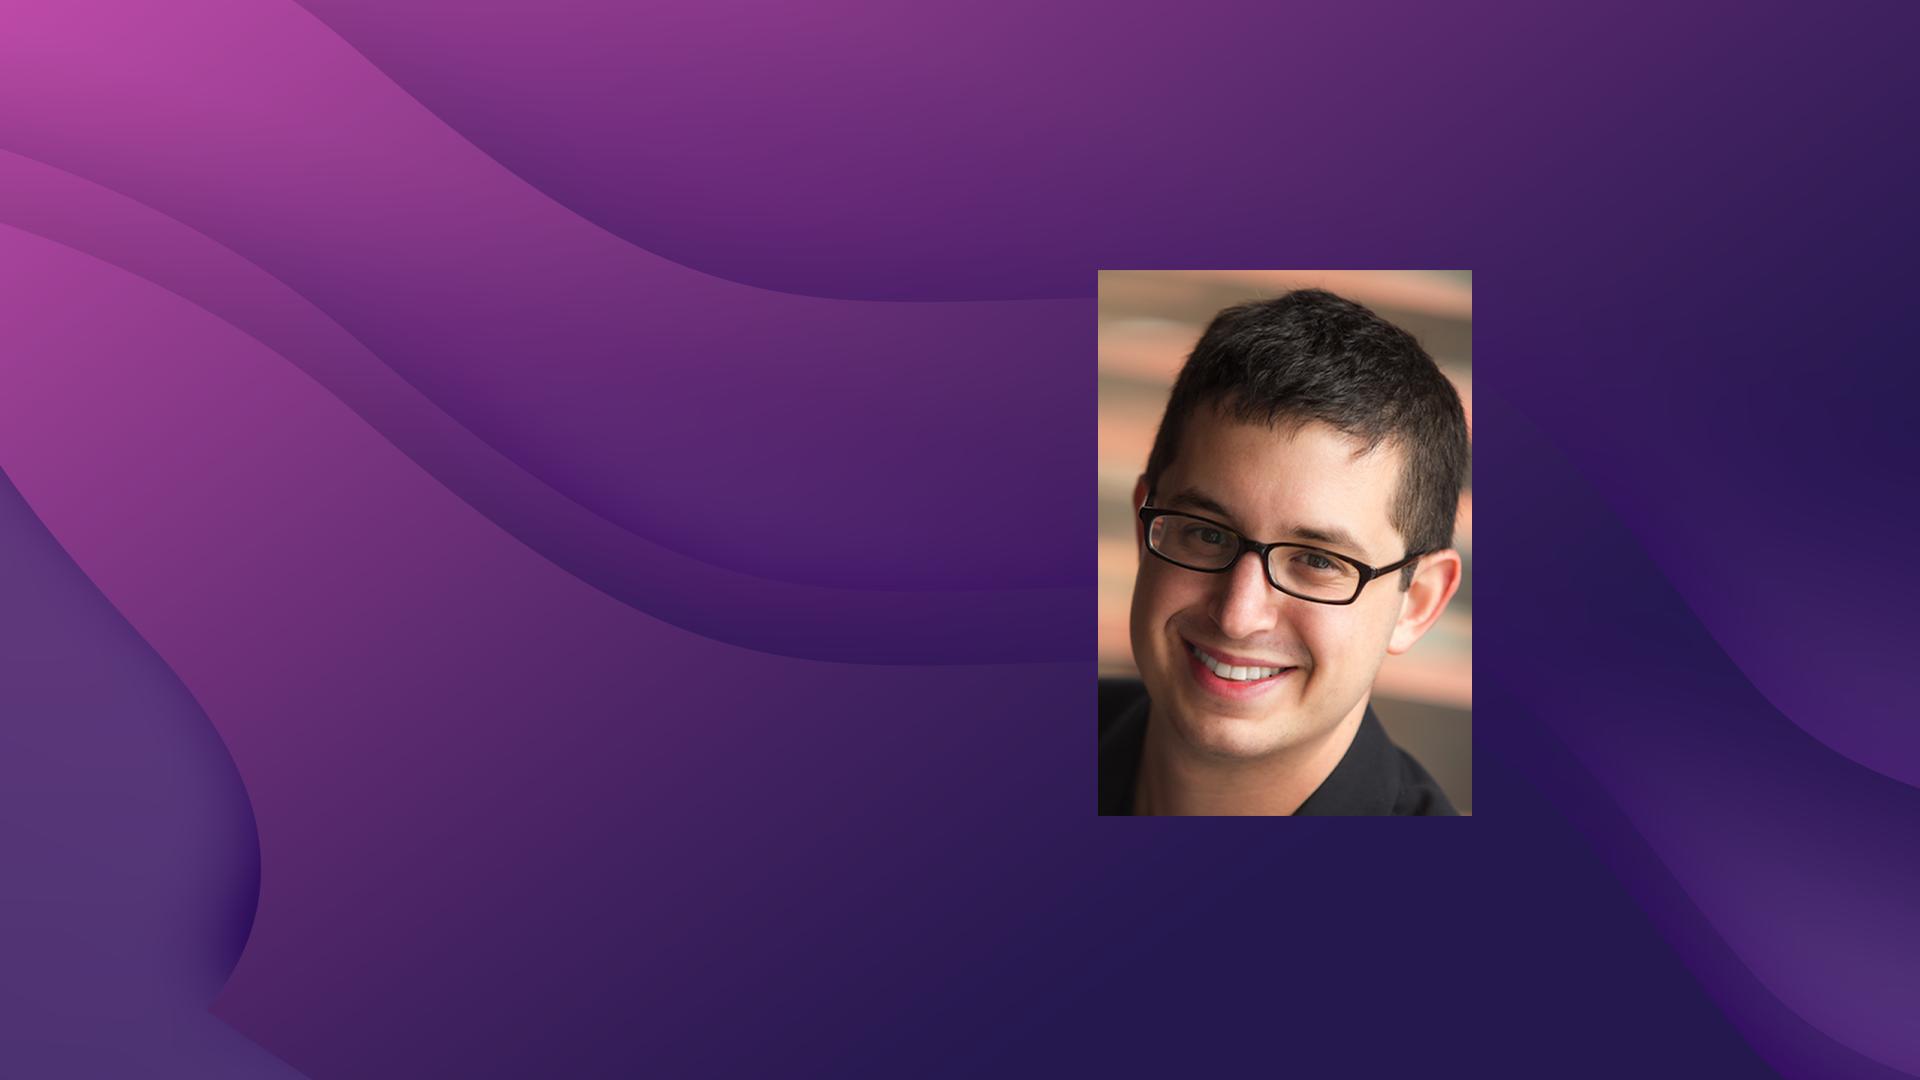 1199: Foursquare Engineering and Innovation Labs Advisor Max Sklar